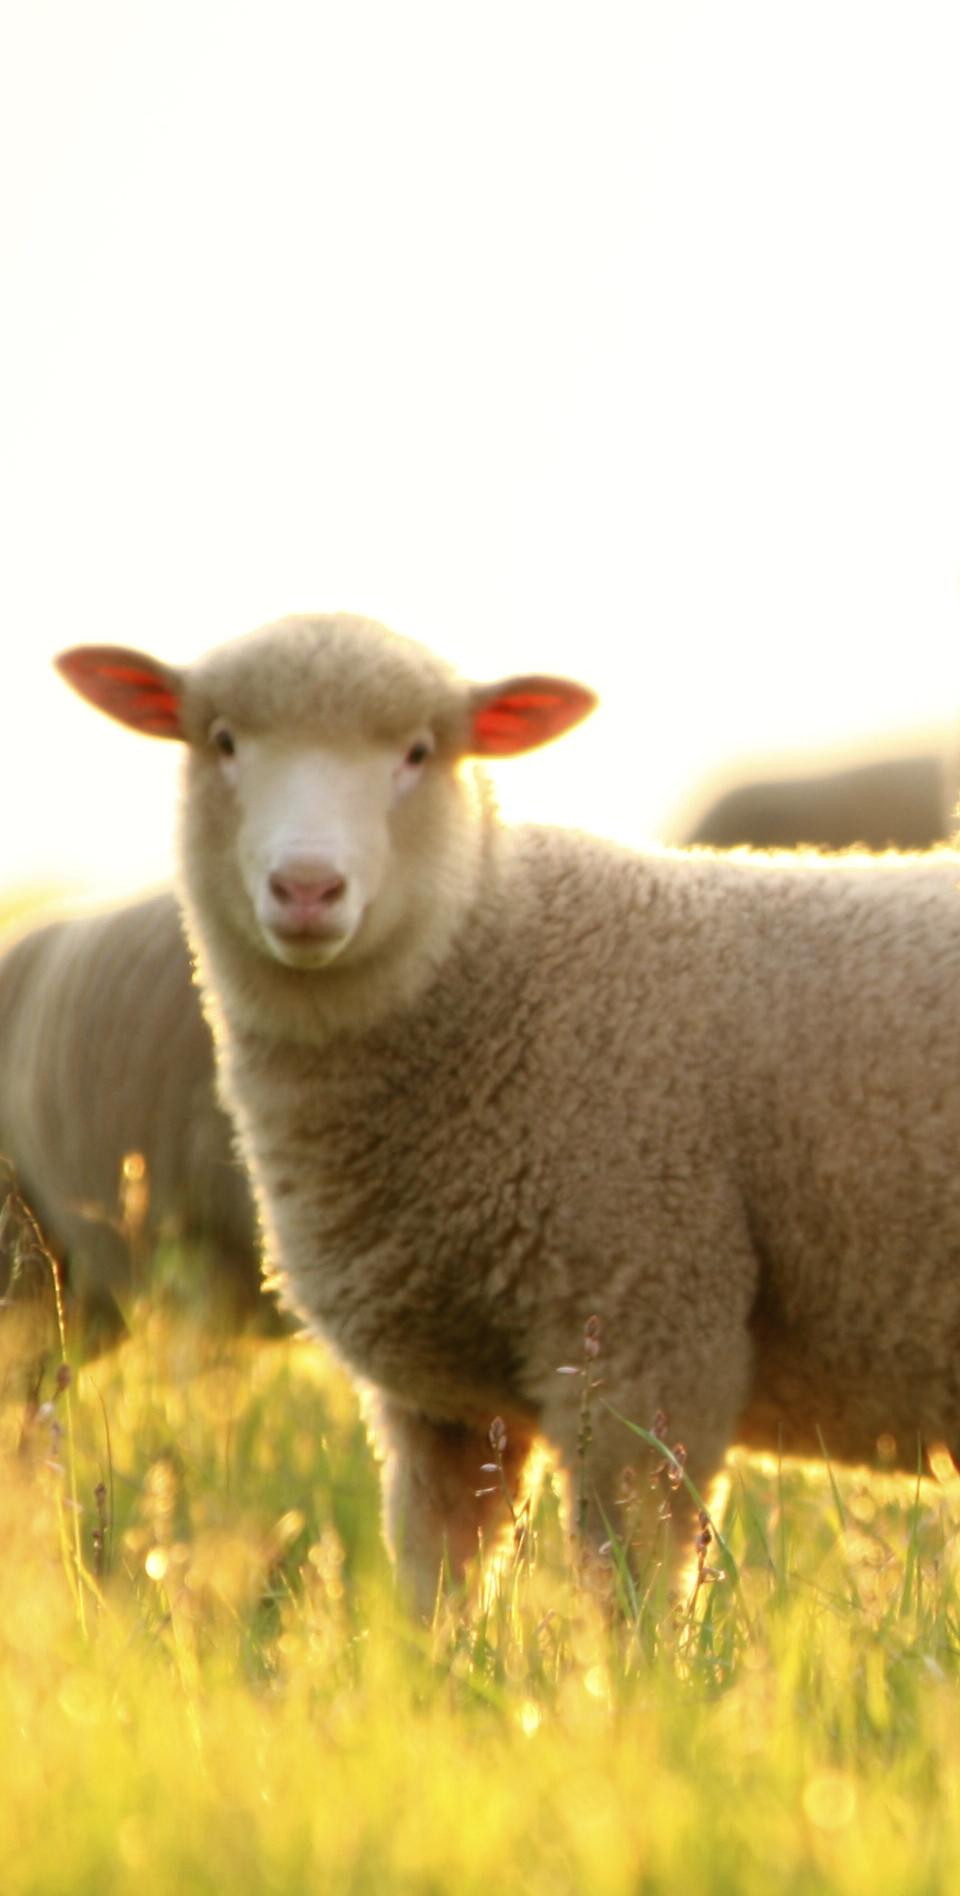 iStock_000008998511Large - lamb